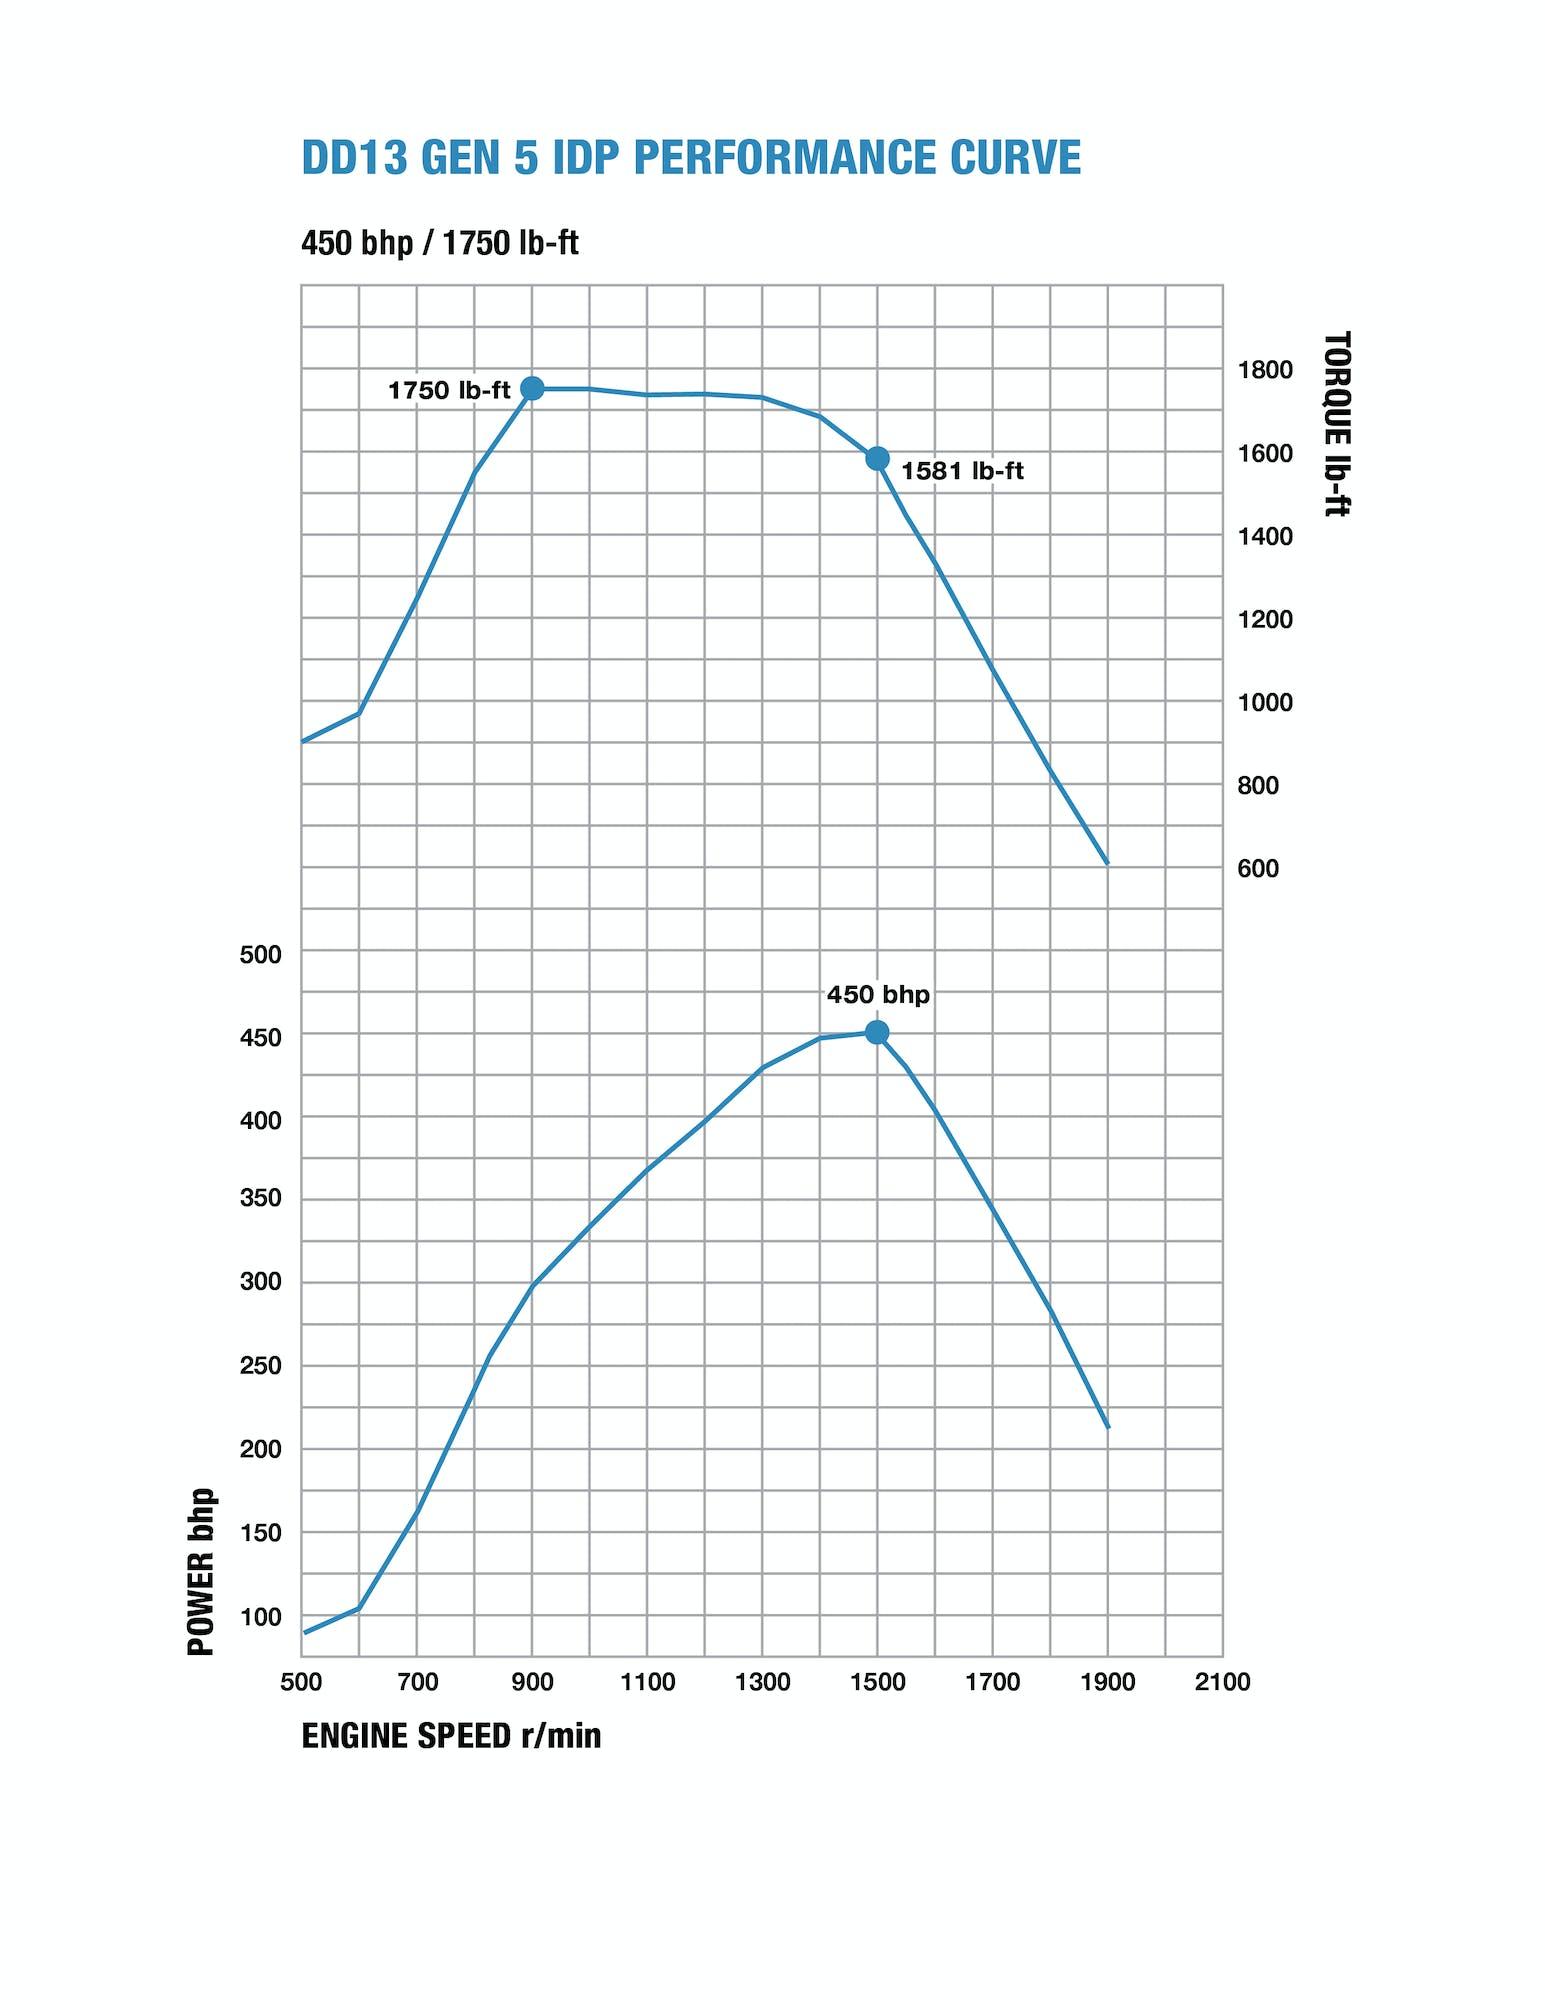 dd13-gen-5-idp-performance-chart.jpg